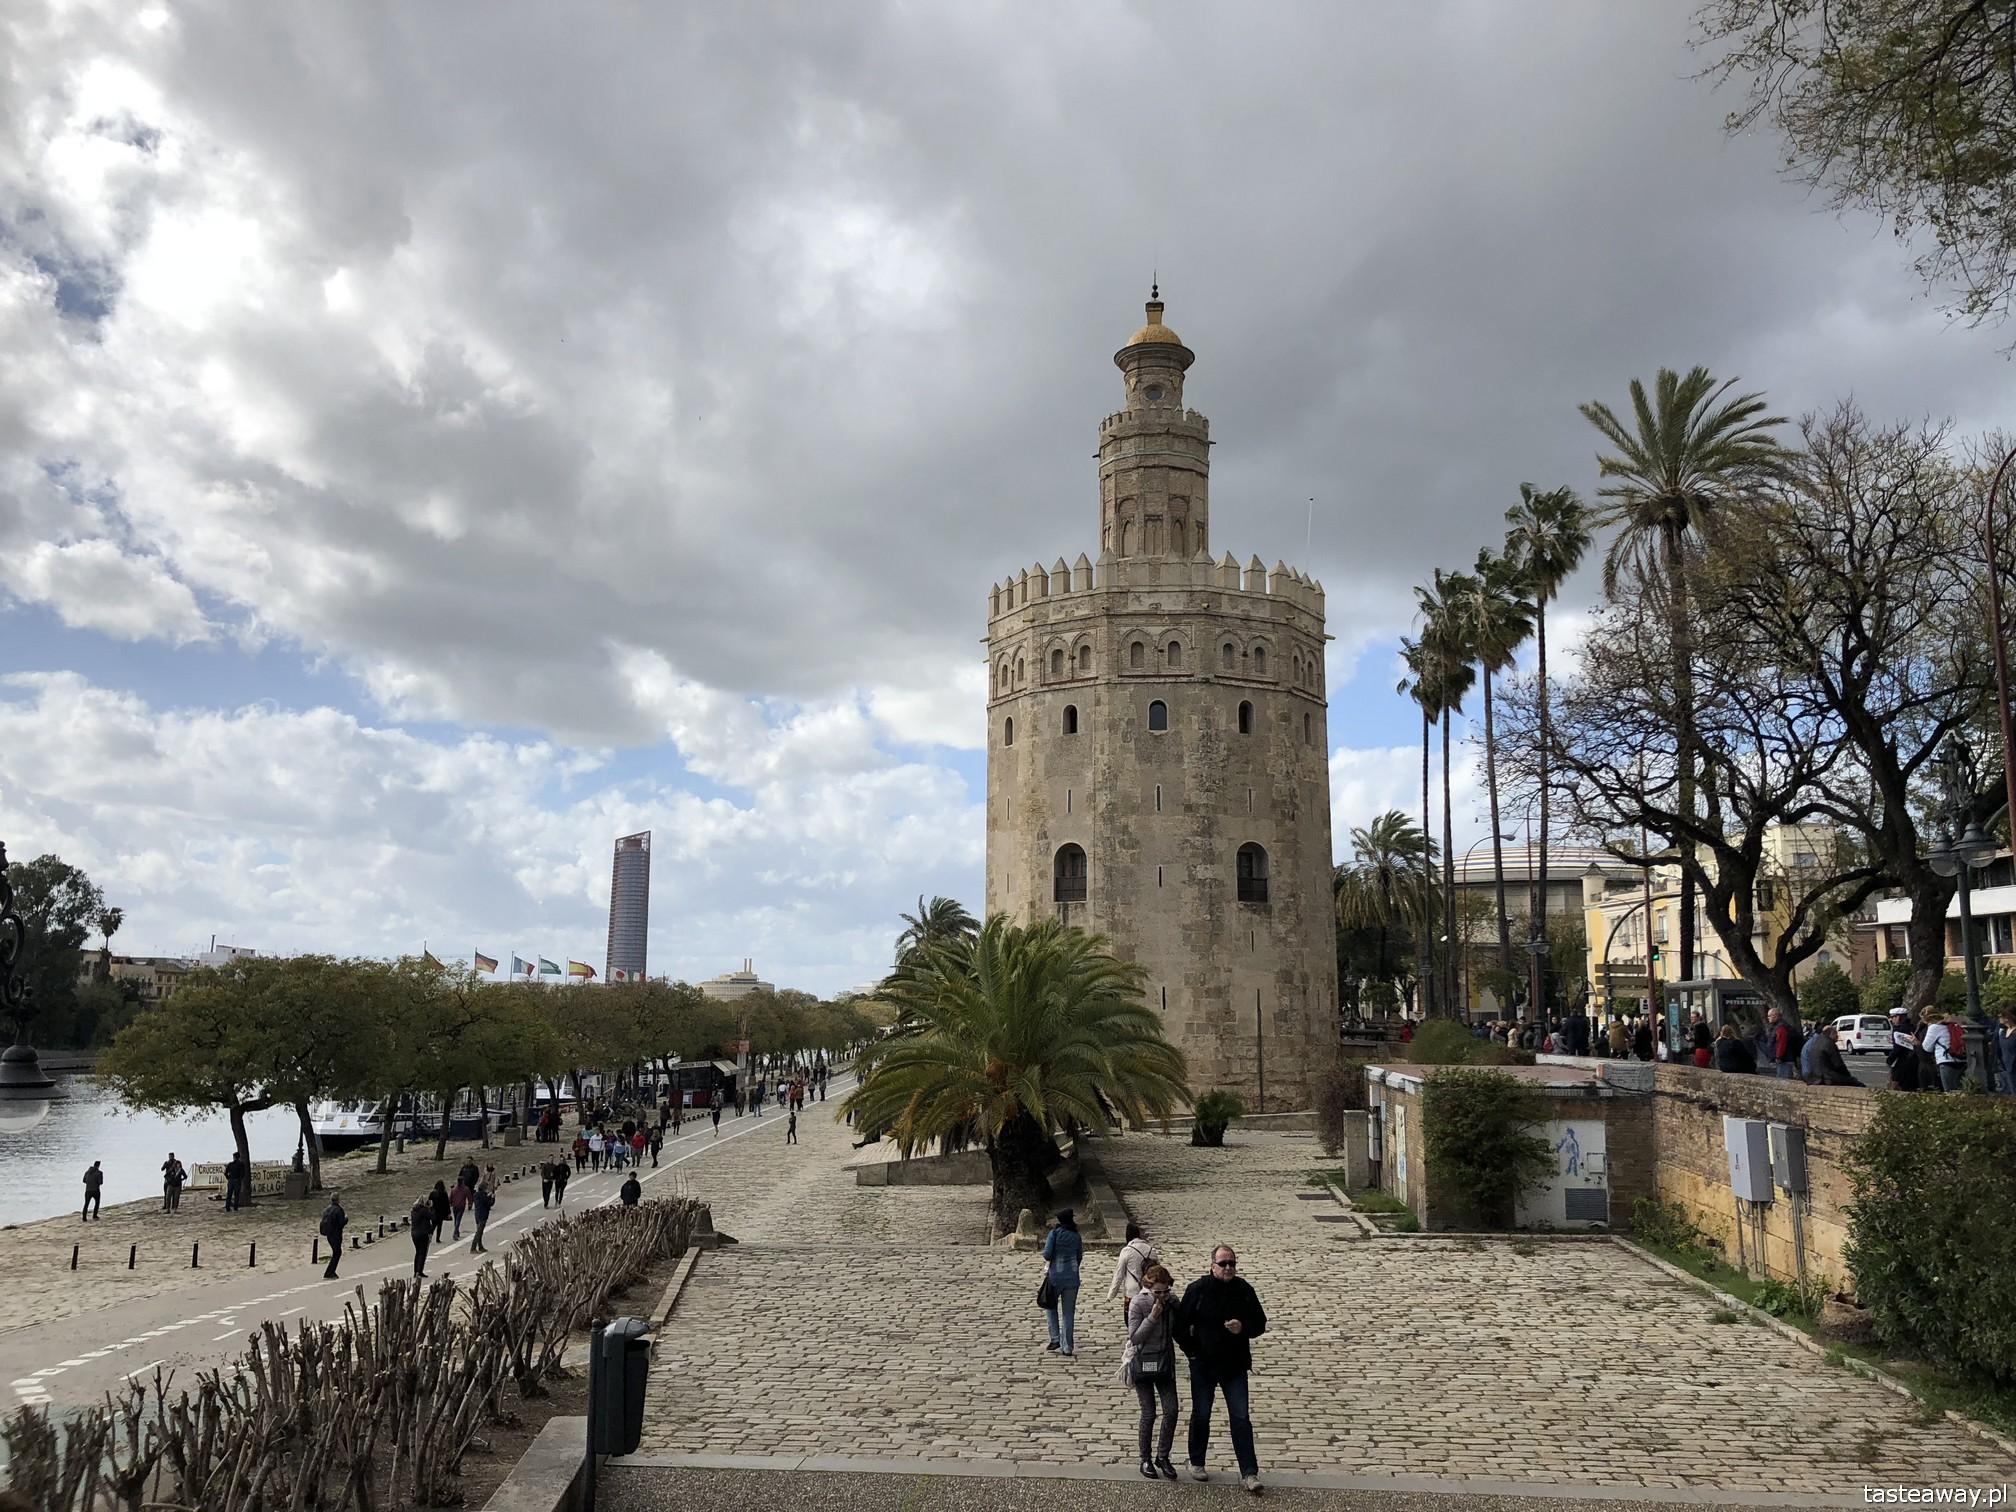 Sewilla, Sevilla, co zobaczyć w Sewilli, Sevilla w jeden dzień, Andaluzja, miasta Hiszpanii, spacer po Sevilli, Torre del Oro